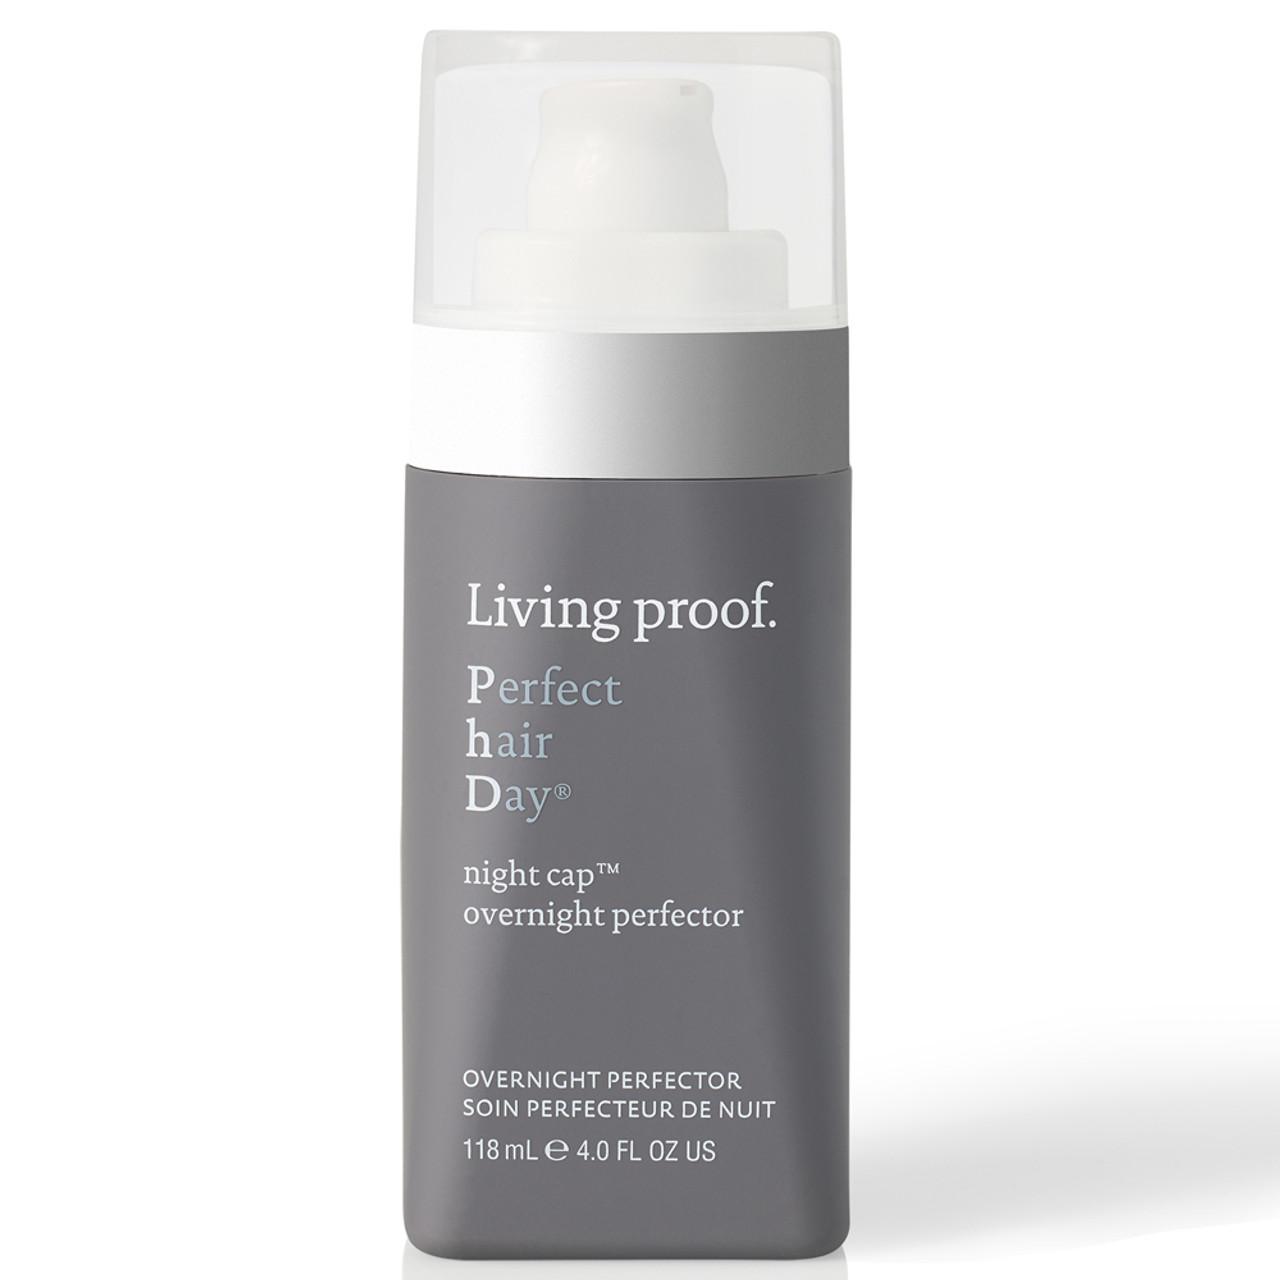 Living Proof Perfect hair Day (PhD) Night Cap Overnight Perfector BeautifiedYou.com